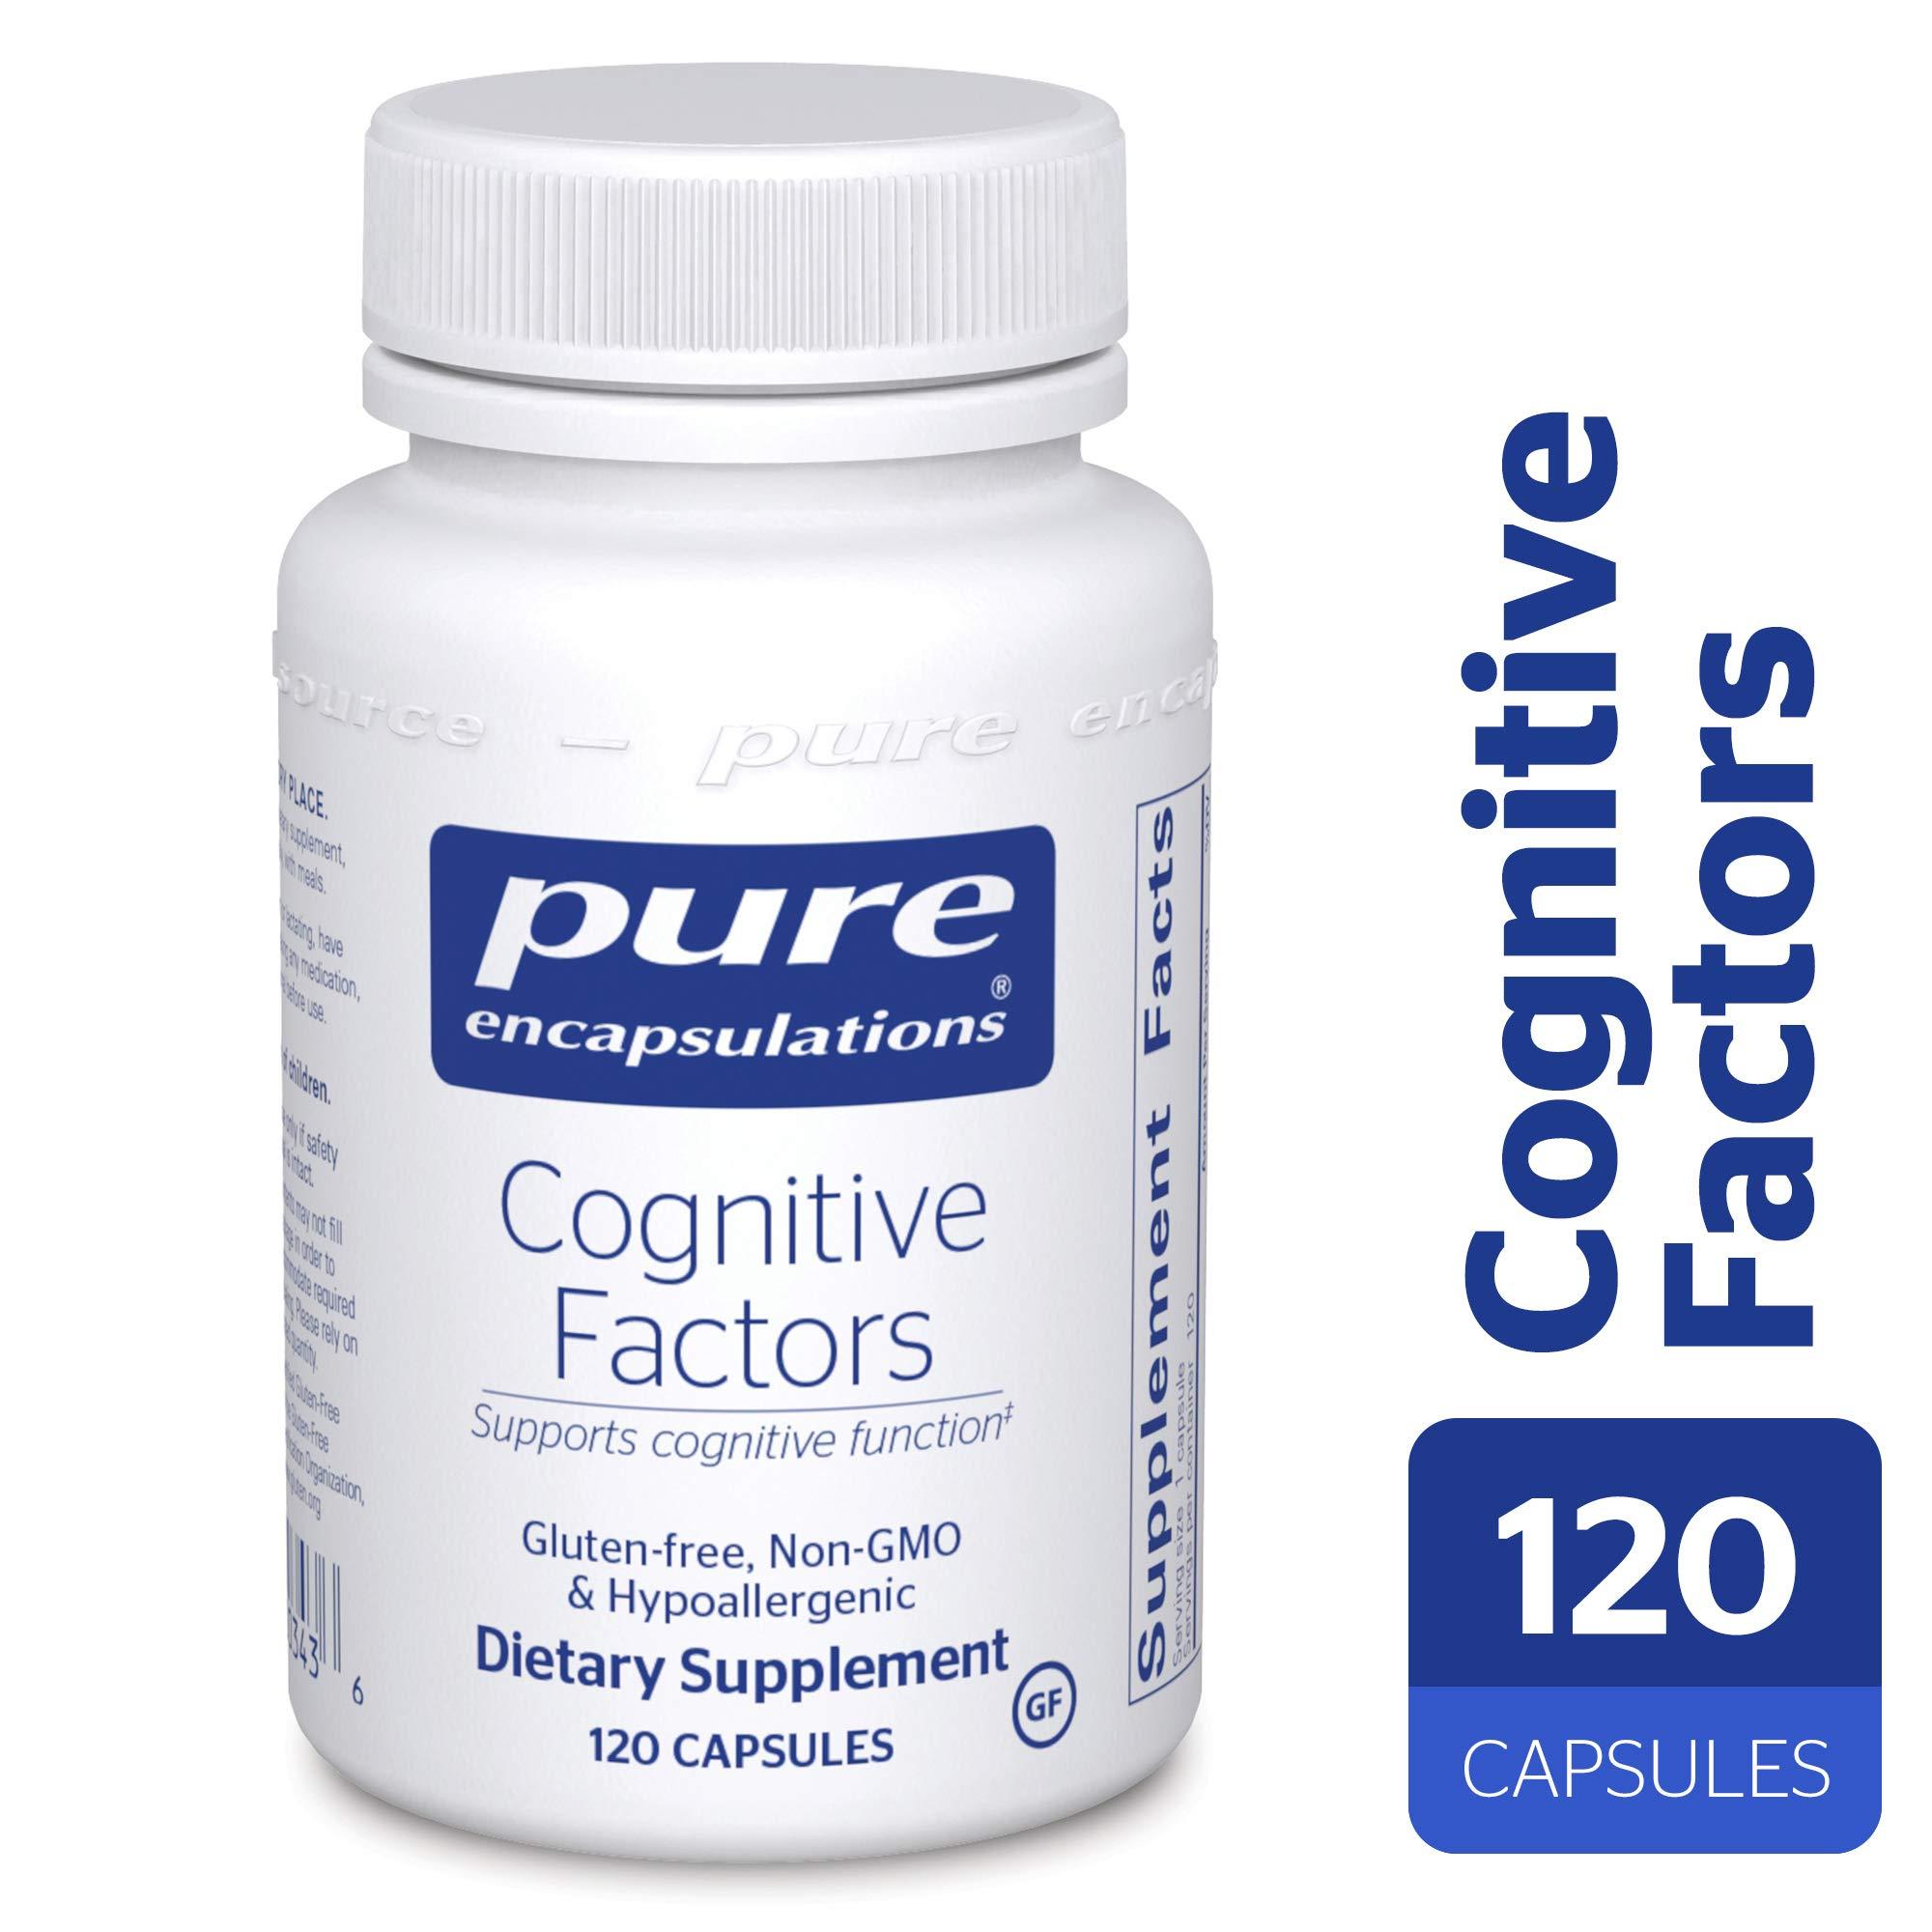 Pure Encapsulations - Cognitive Factors - Hypoallergenic Supplement for Cognitive Function Support* - 120 Capsules